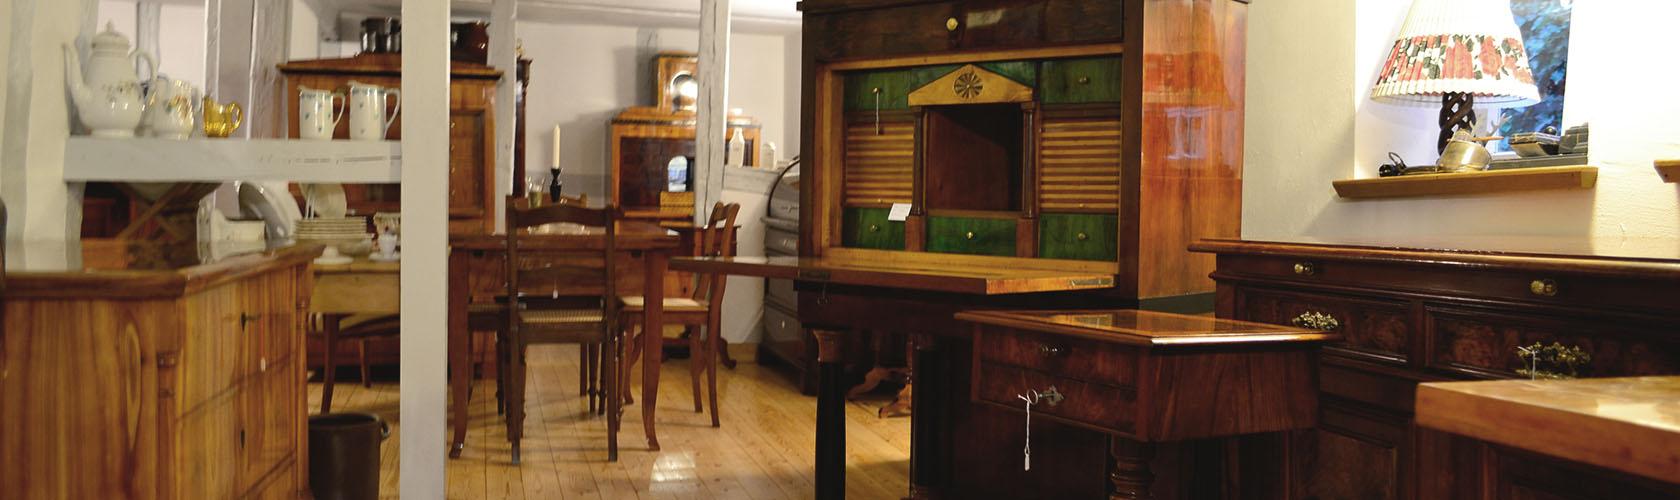 antiquit ten am rabenturm astrid riedel m hlhausen th ringen willkommen. Black Bedroom Furniture Sets. Home Design Ideas